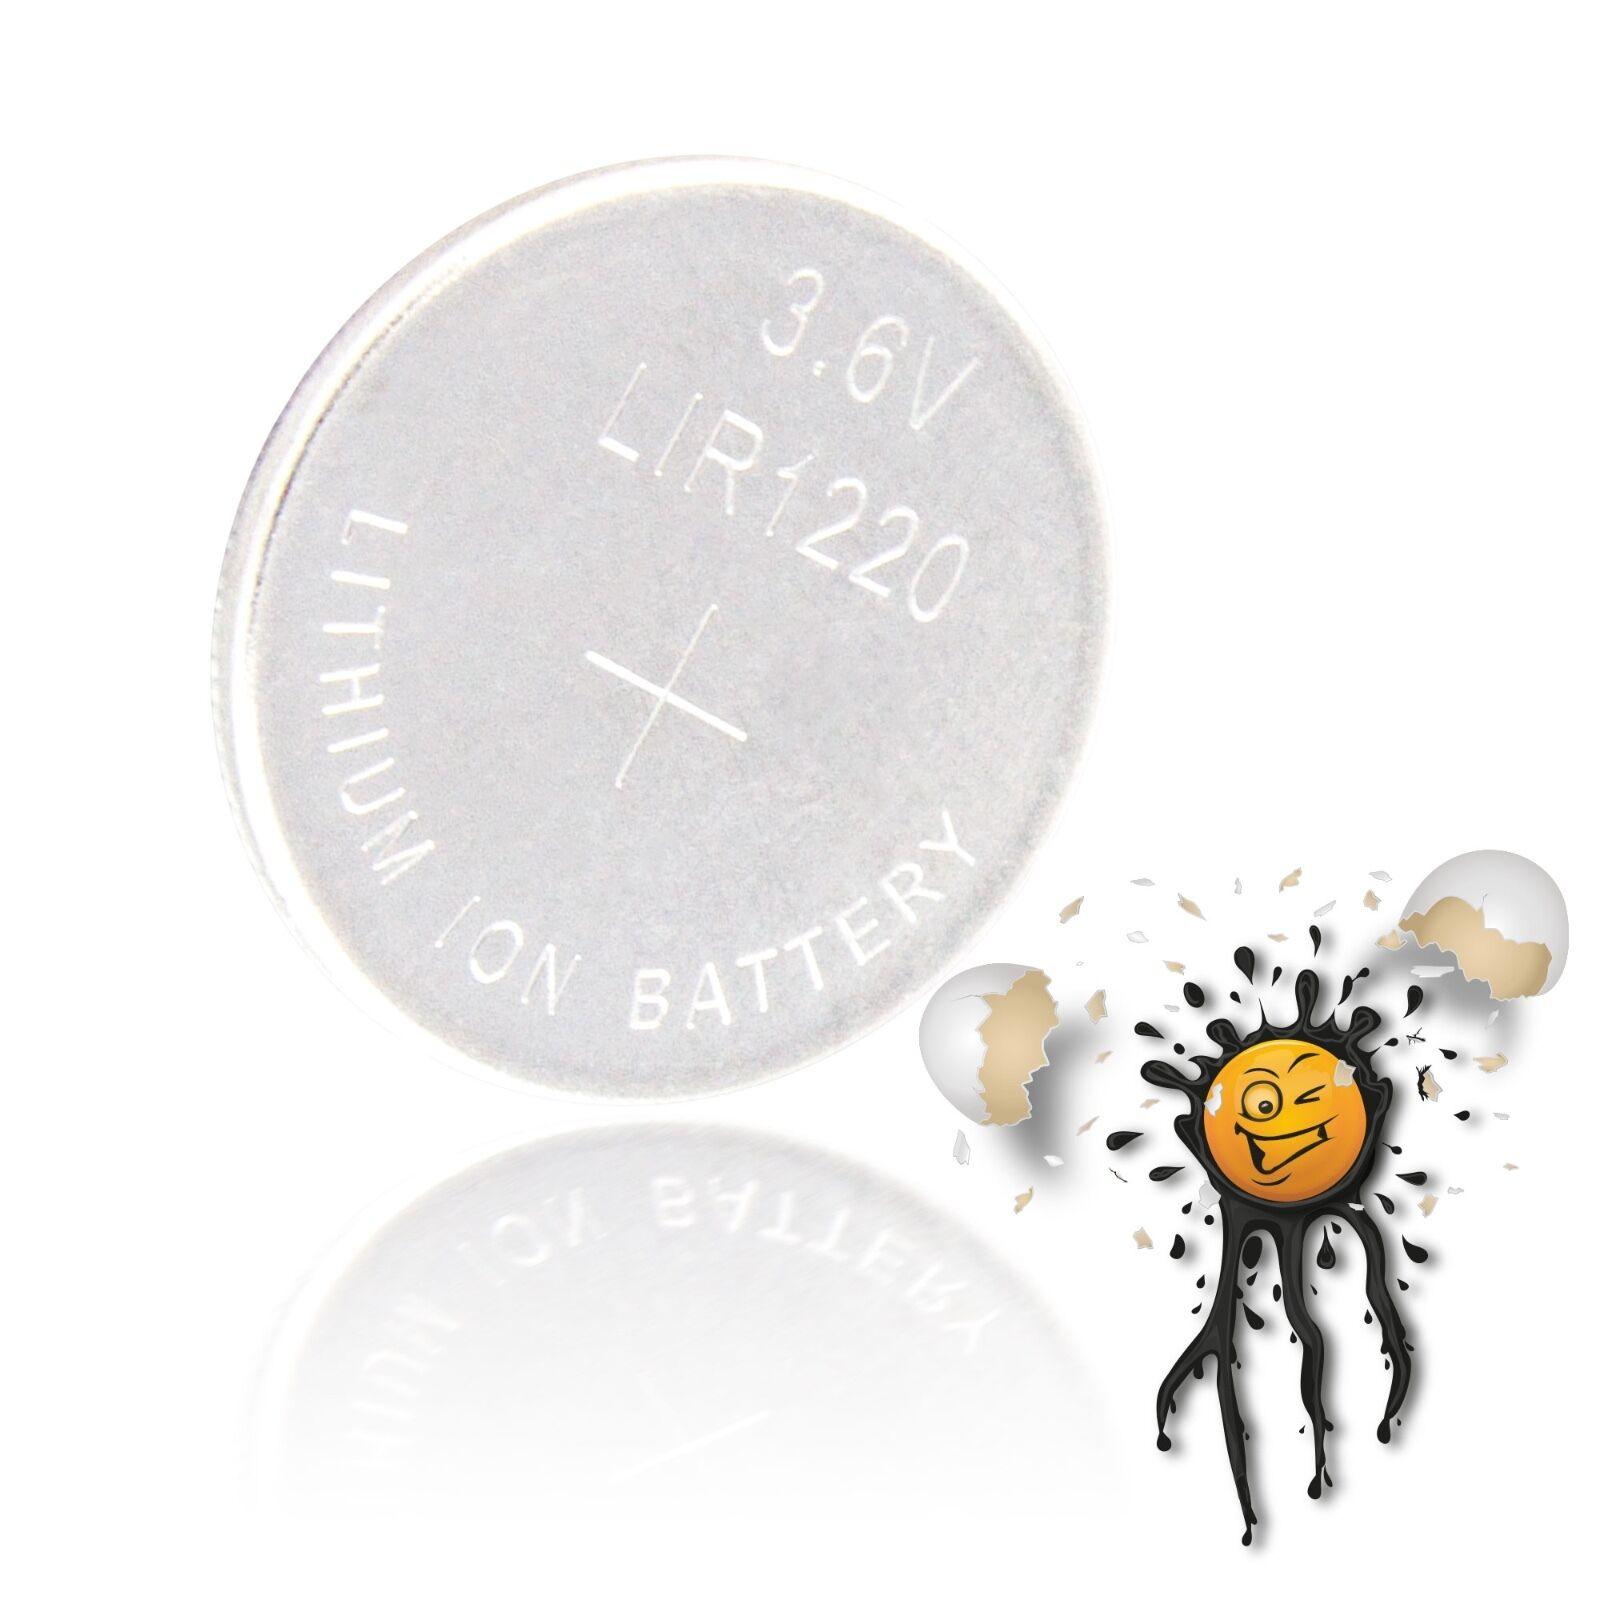 40 St.Neu Original LIR2032 3.6V LI-ION Wiederaufladbar Knopfzelle Batterie